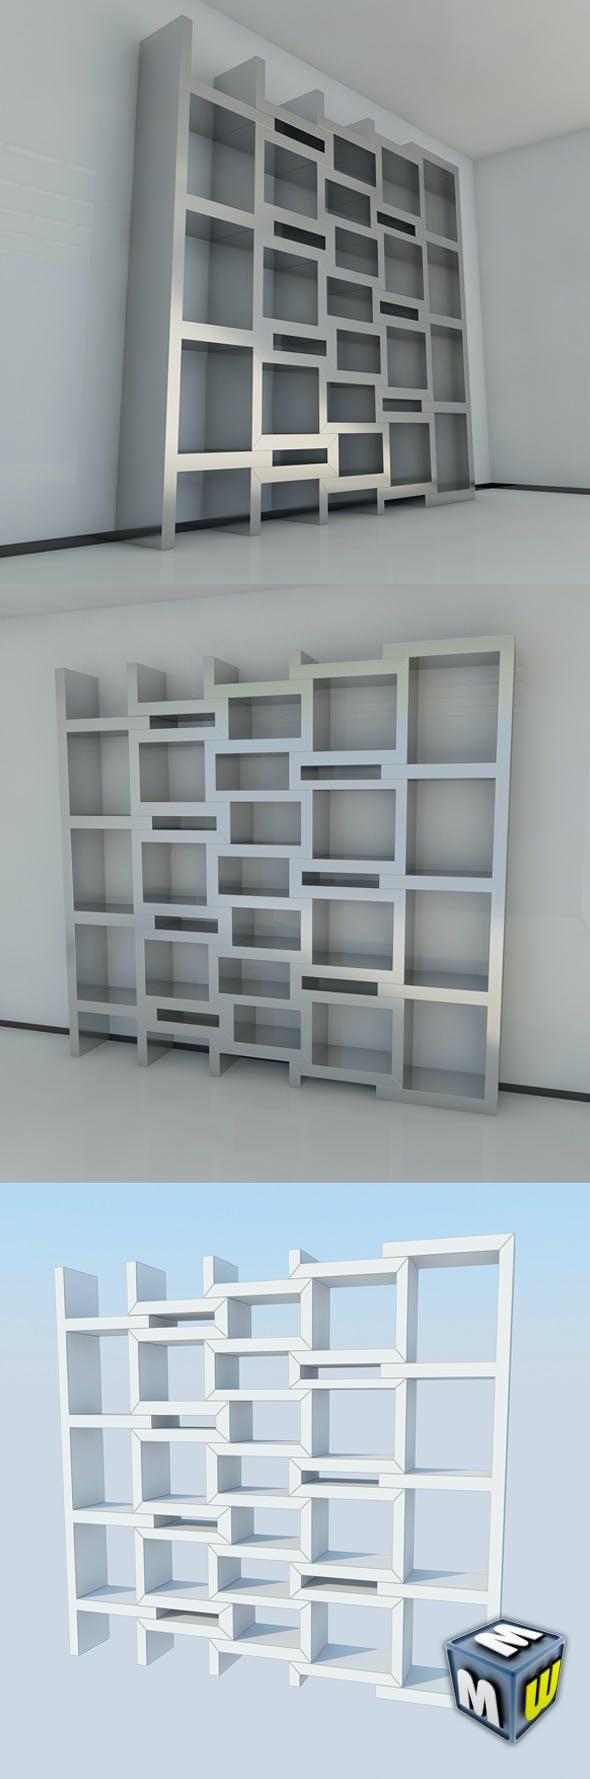 Bookshelf 9 MAX 2011 - 3DOcean Item for Sale